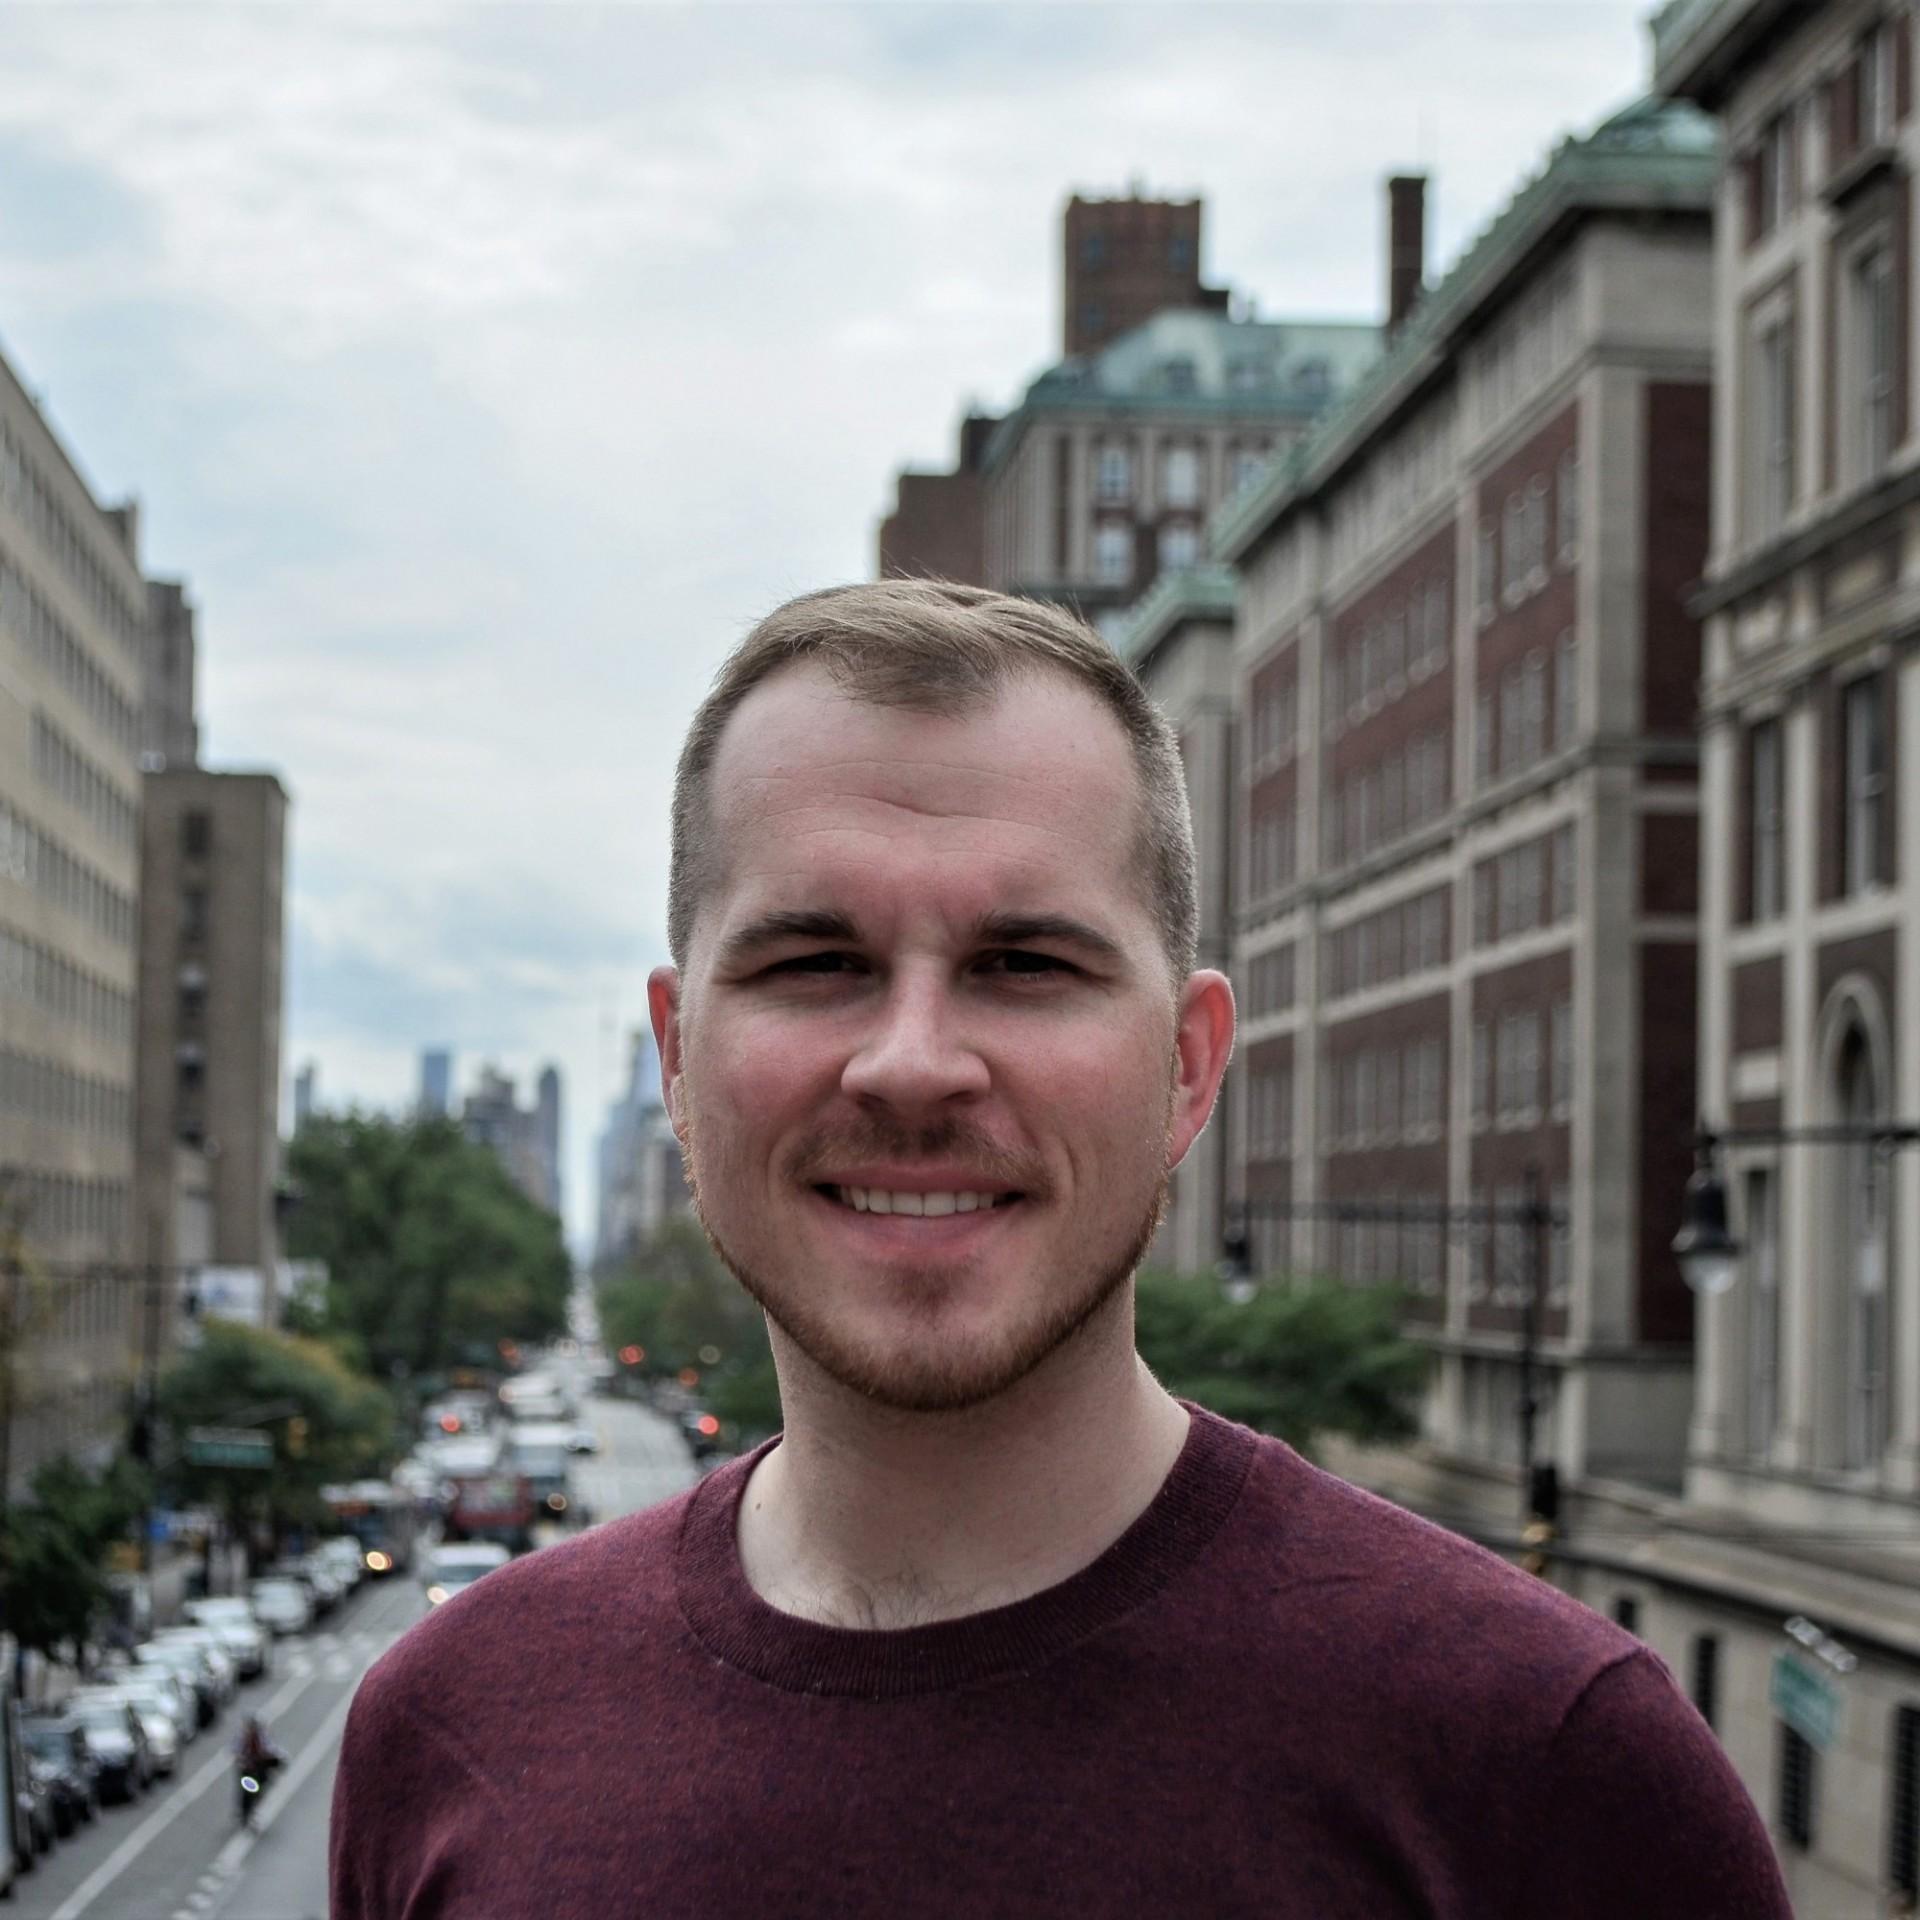 photo of Kristofer Seibt